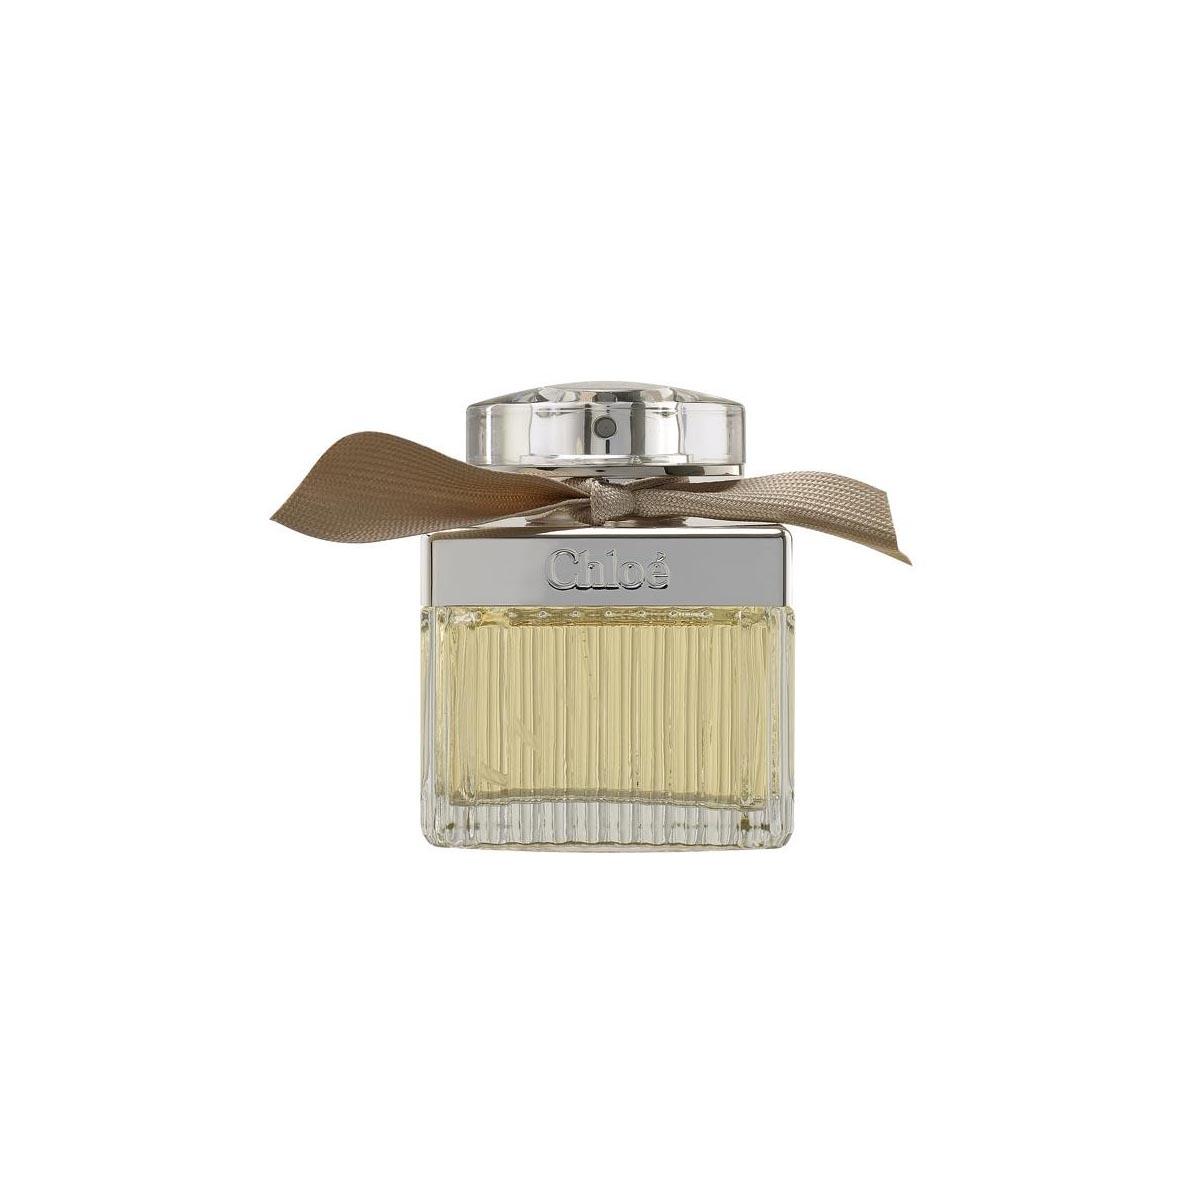 Chloe eau de parfum 50ml vaporizador